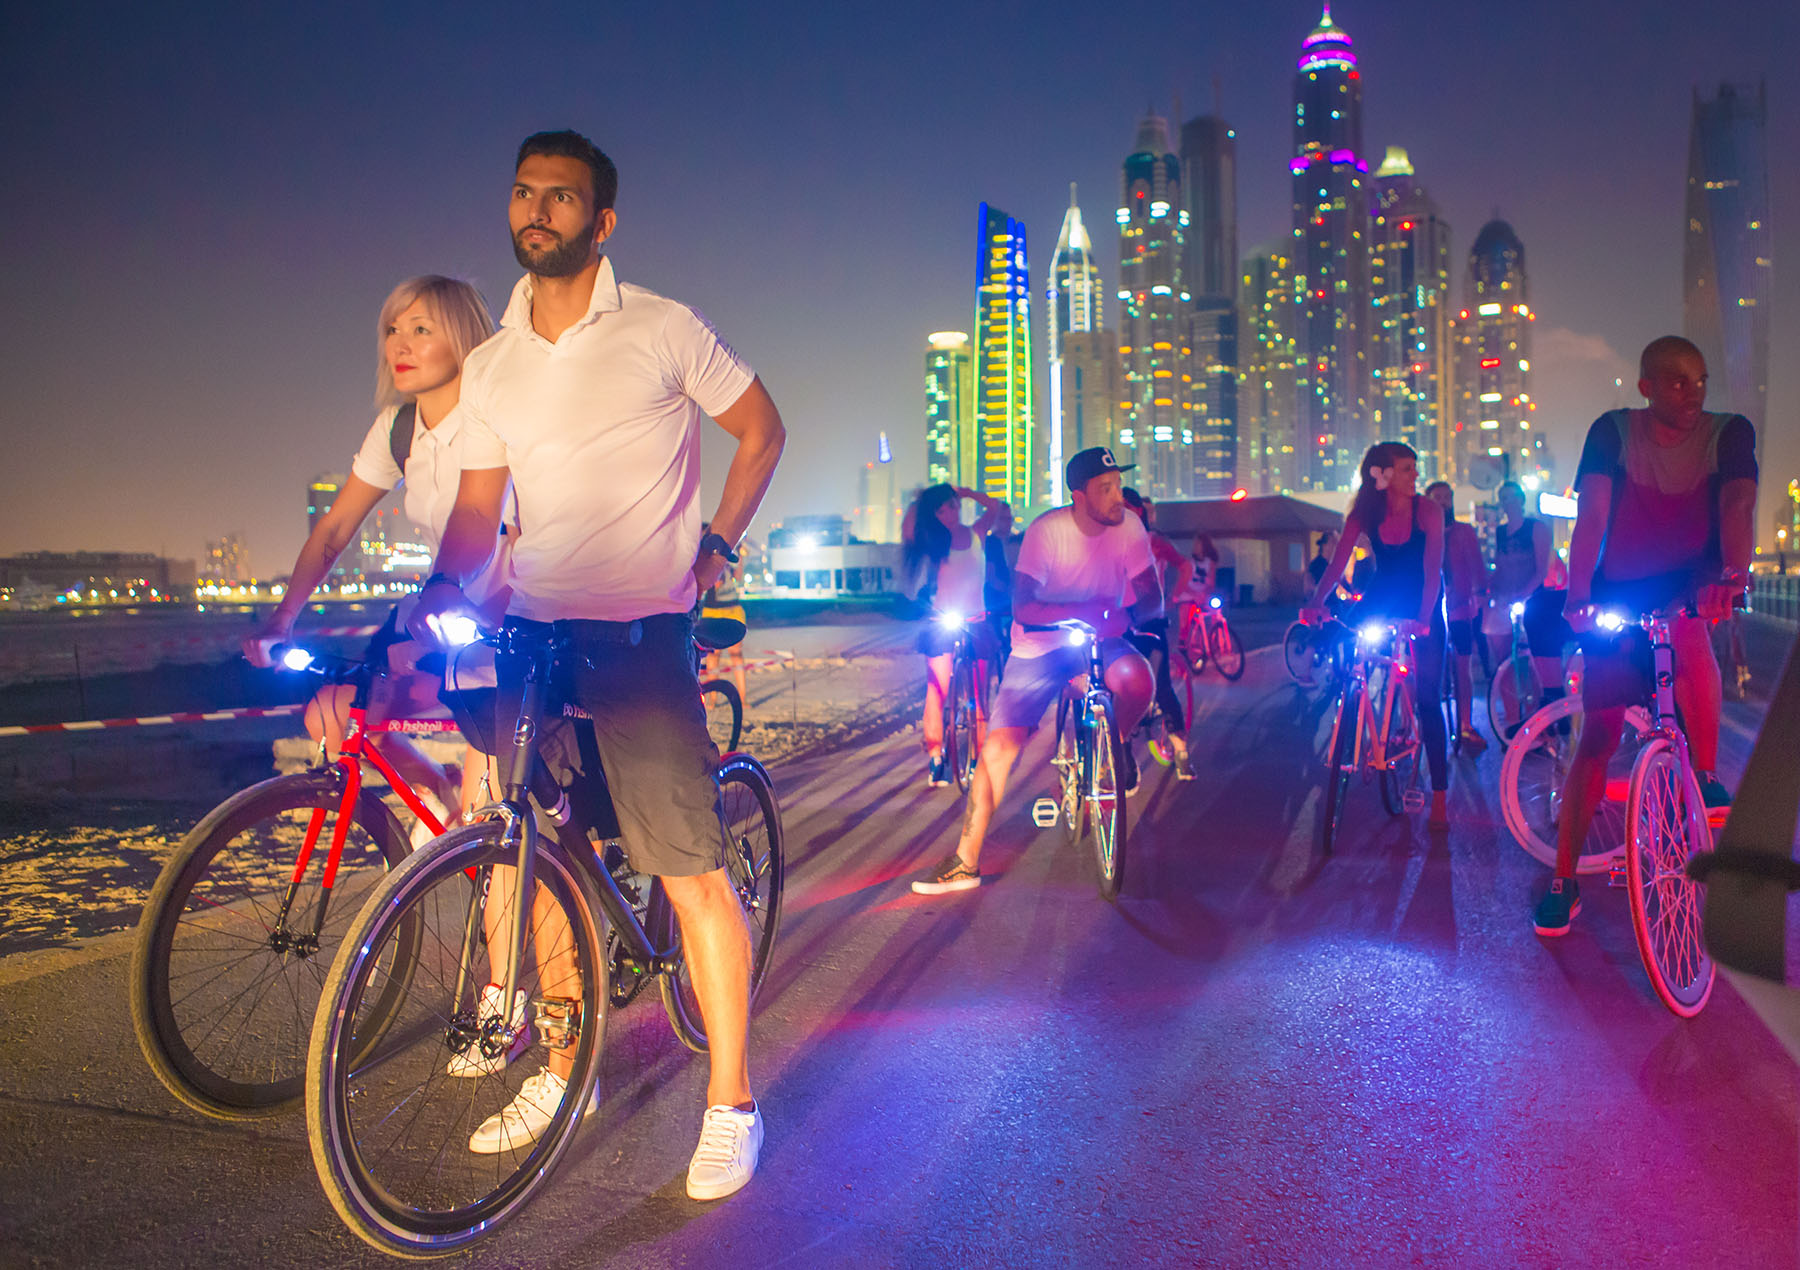 Influencers ready for the PUMA bike ride event by Loesje Kessels Fashion Photographer Dubai